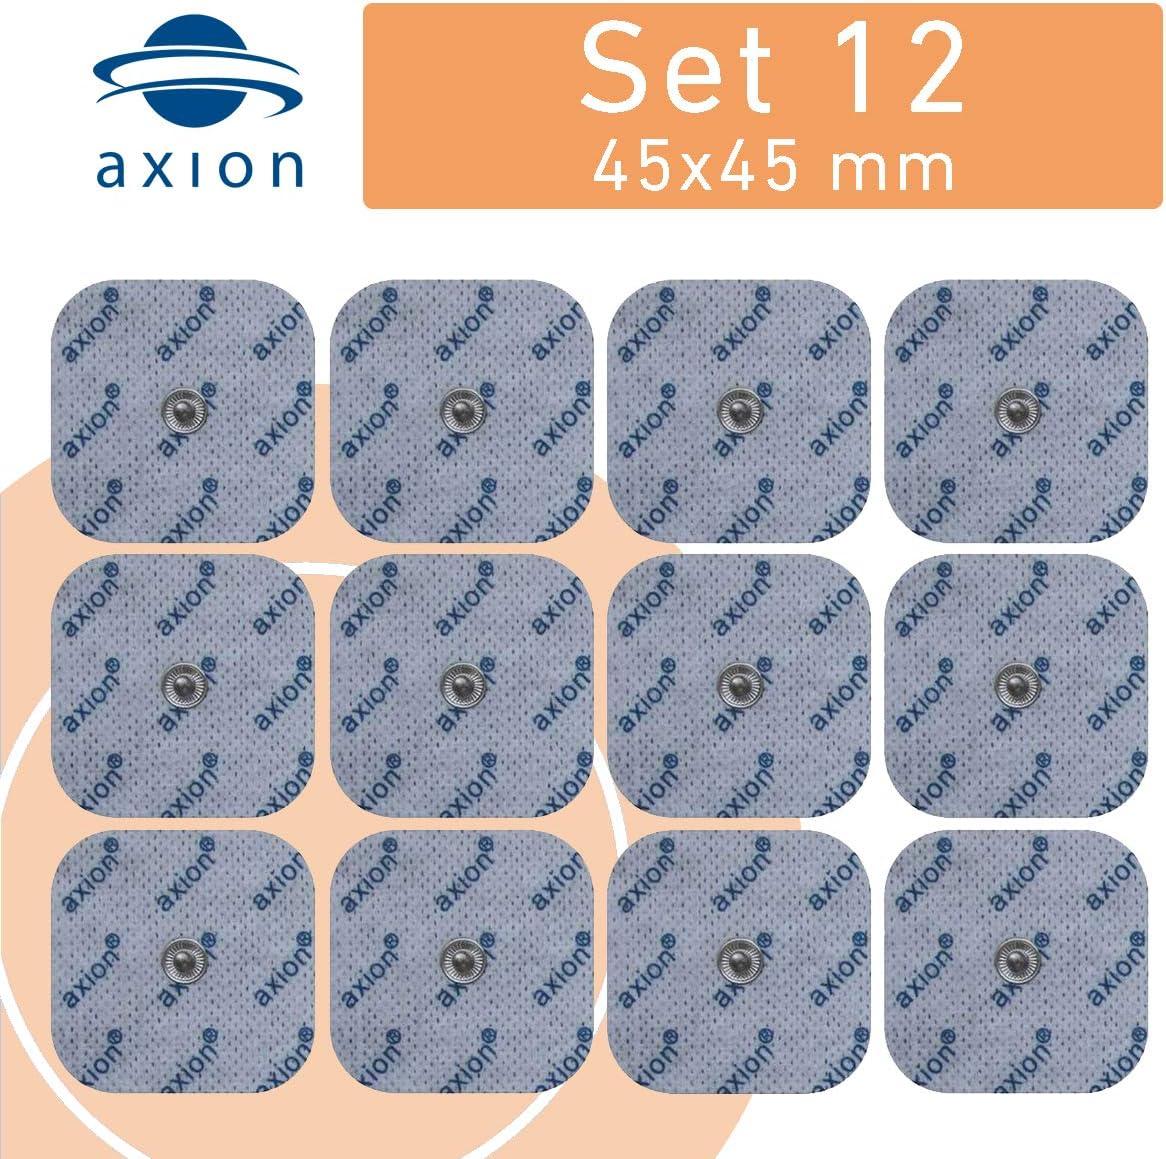 12 Electrodos de 4,5x4,5 cm - para su aparato TENS EMS electroestimulador VITALCONTROL & Beurer - axion